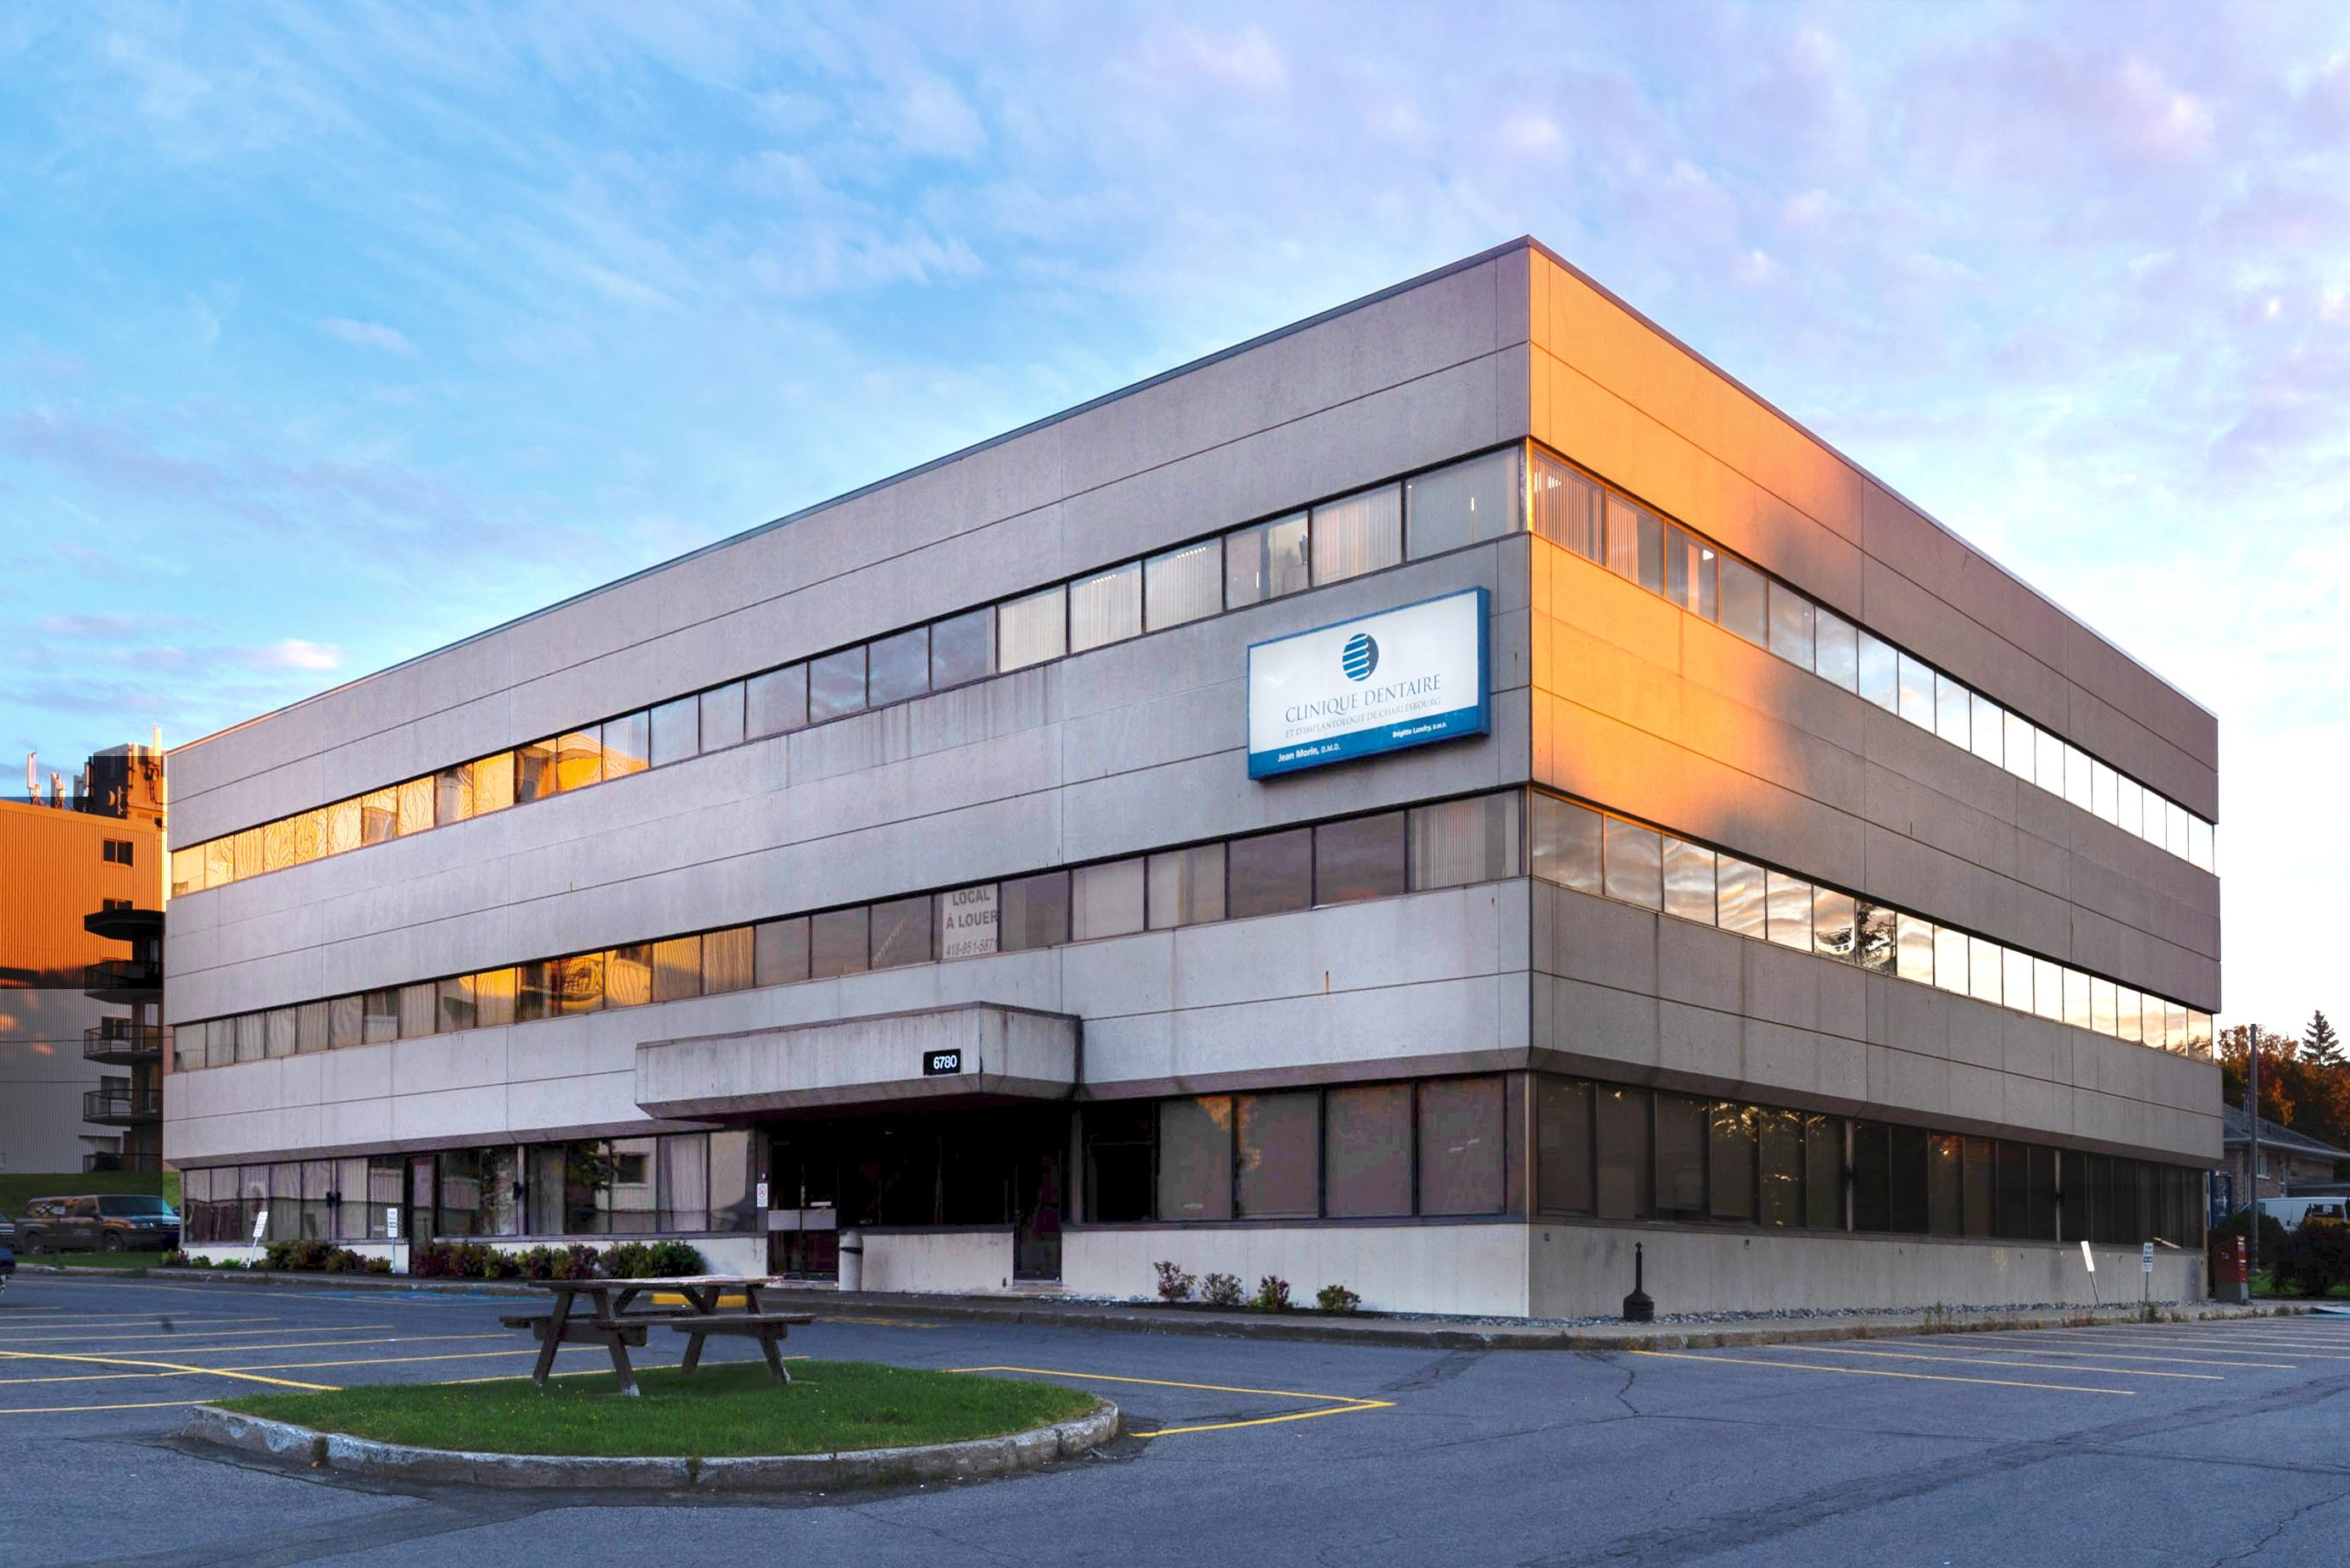 6780 1st Avenue, Quebec City, Québec